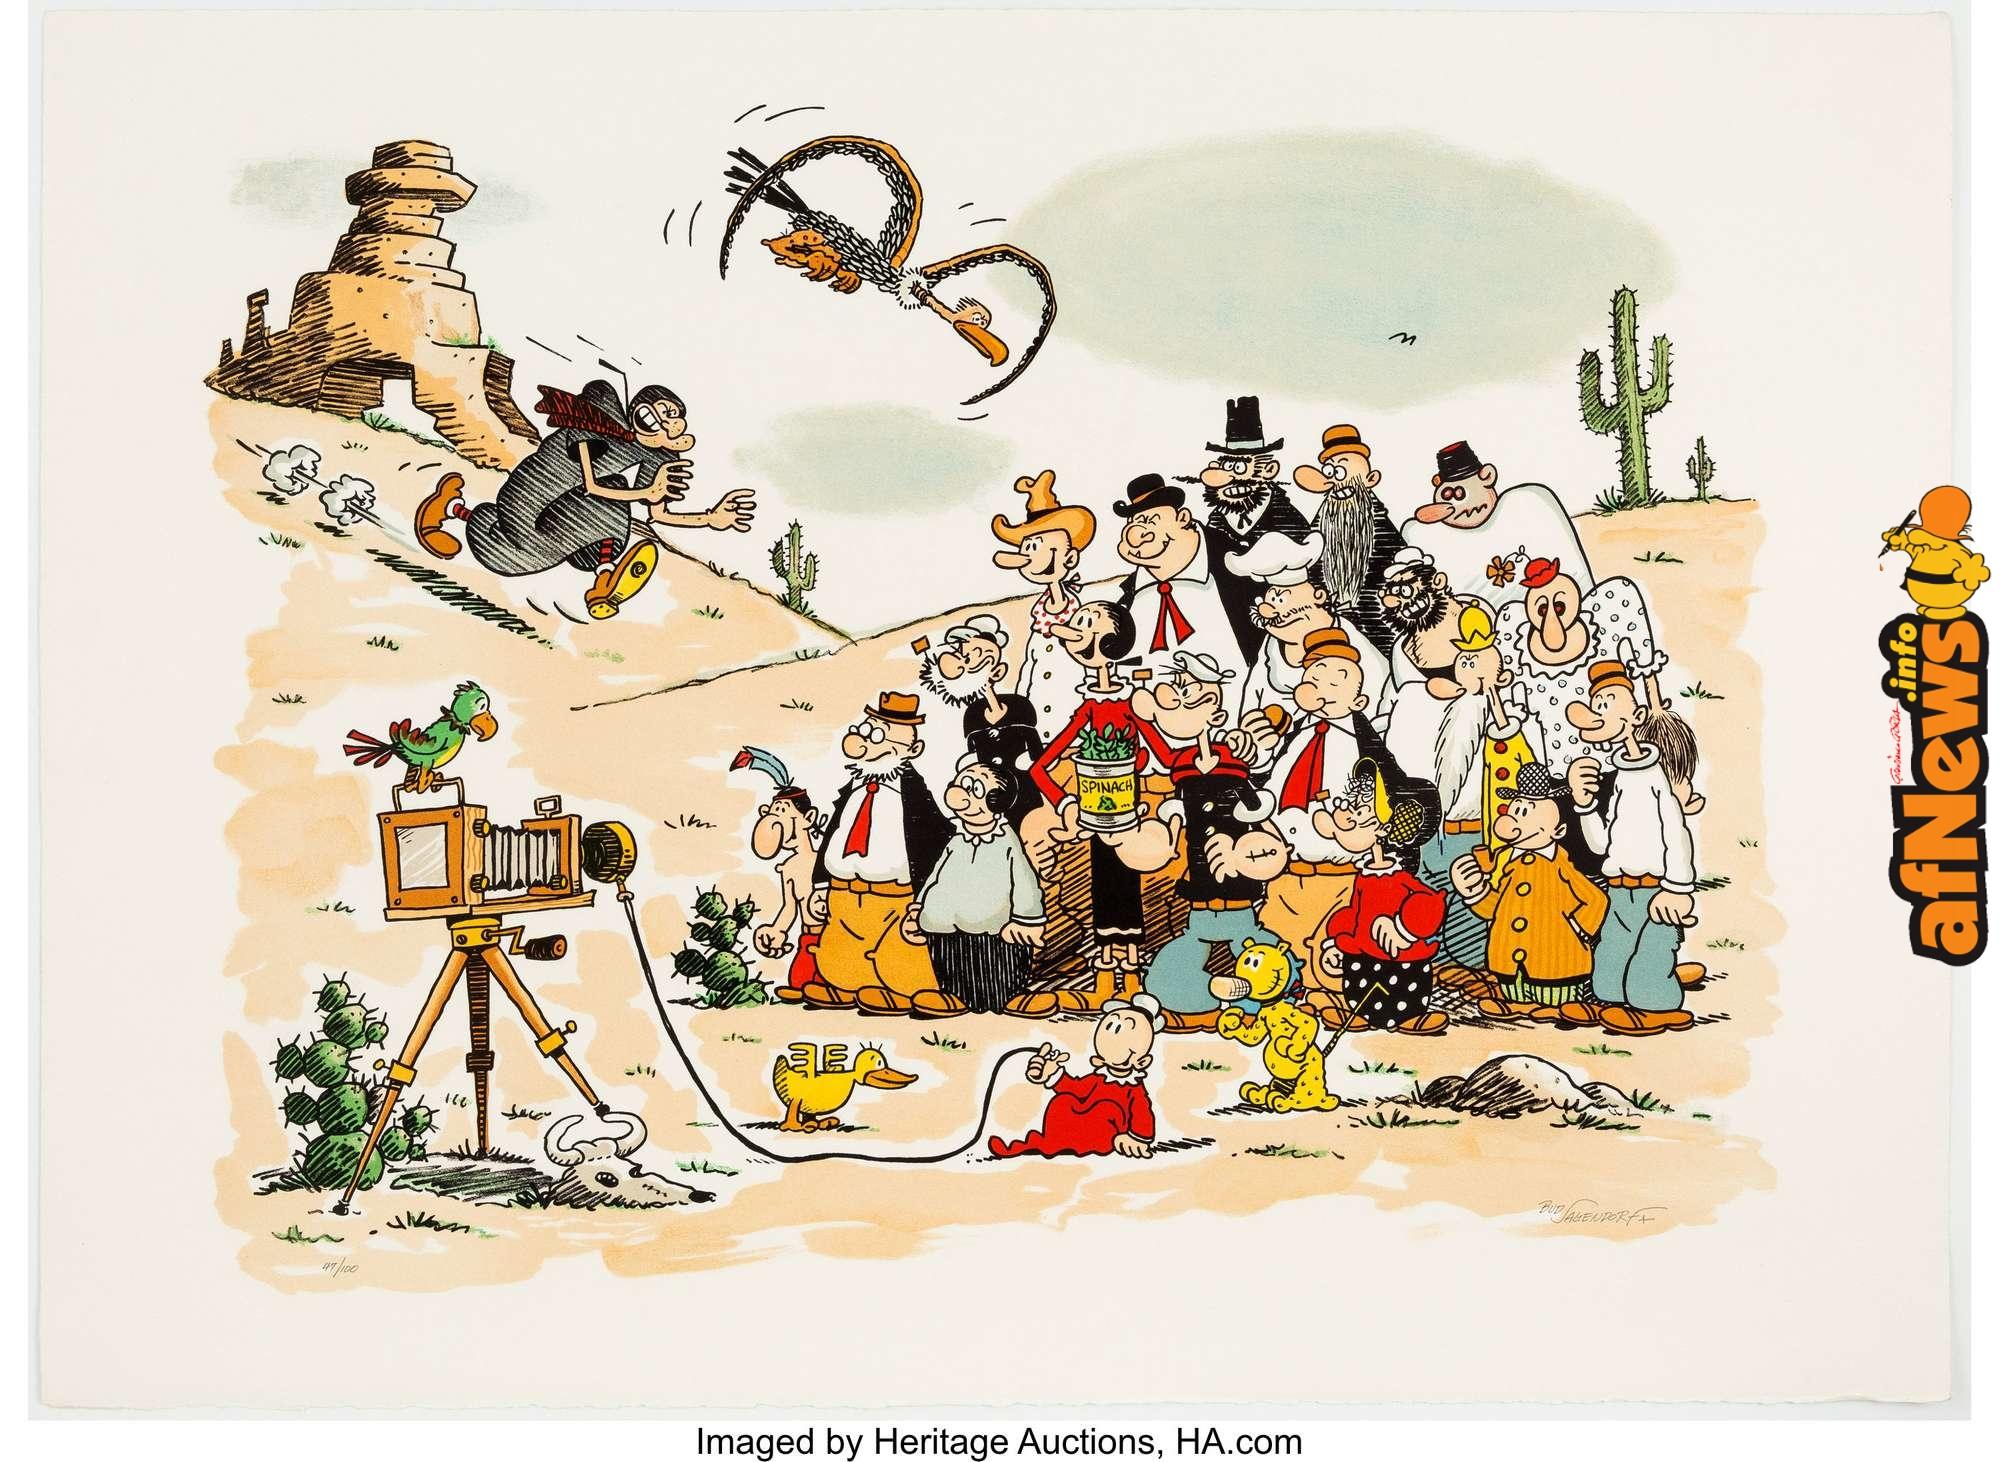 ZooM, Popeye, Wakatoon, Hanna e Barbera, Pico, Tanguy e Laverdure, Blake e Mortimer